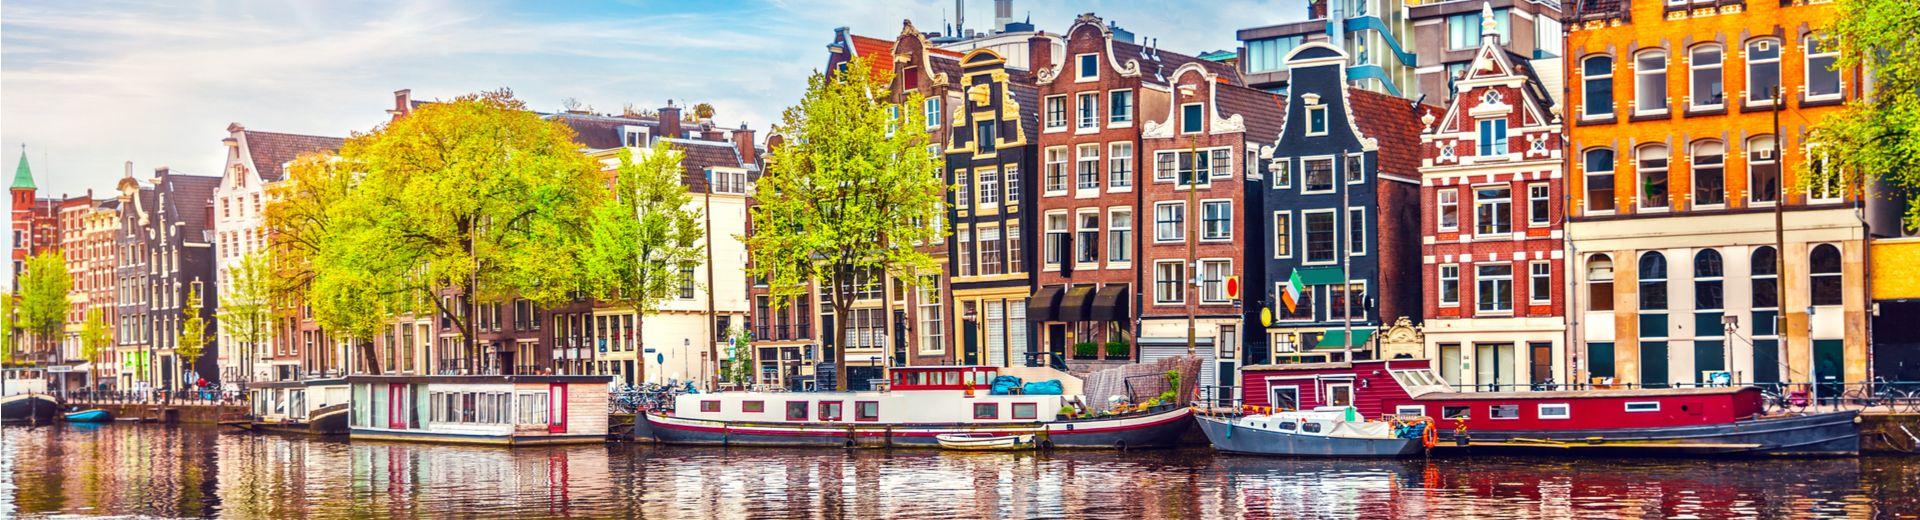 Design-Hotel in Amsterdam